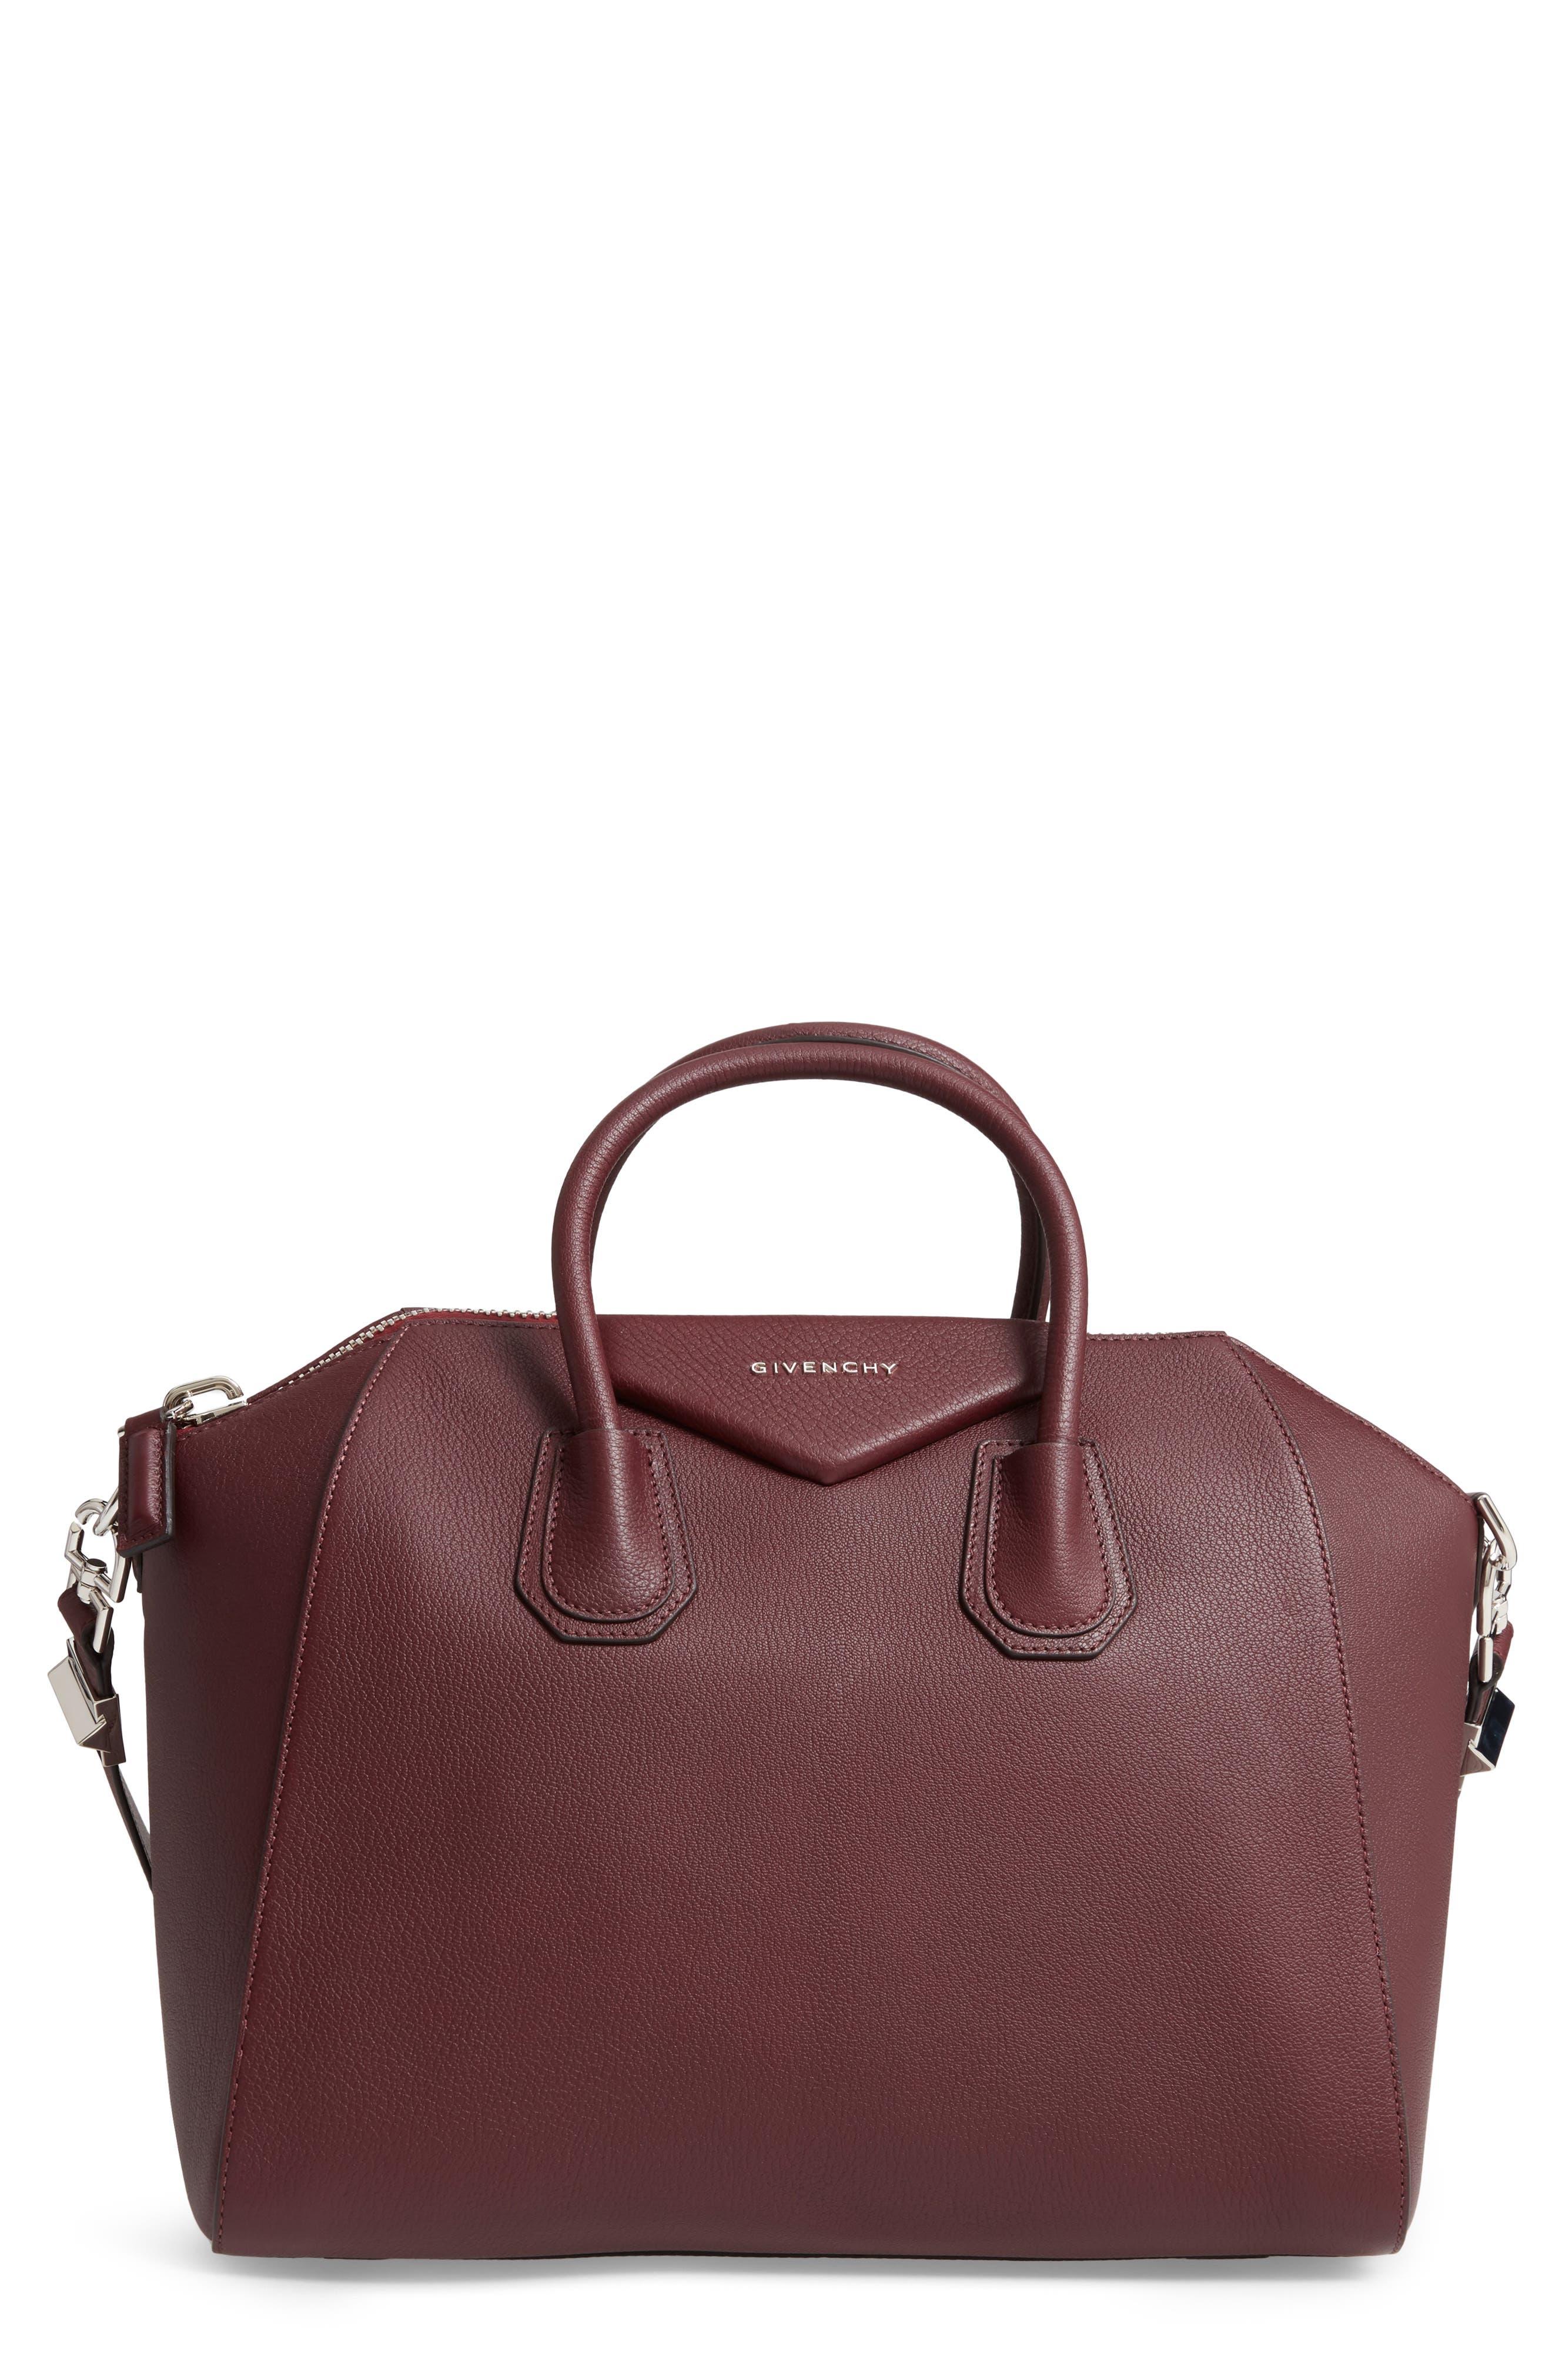 'medium Antigona' Sugar Leather Satchel by Givenchy